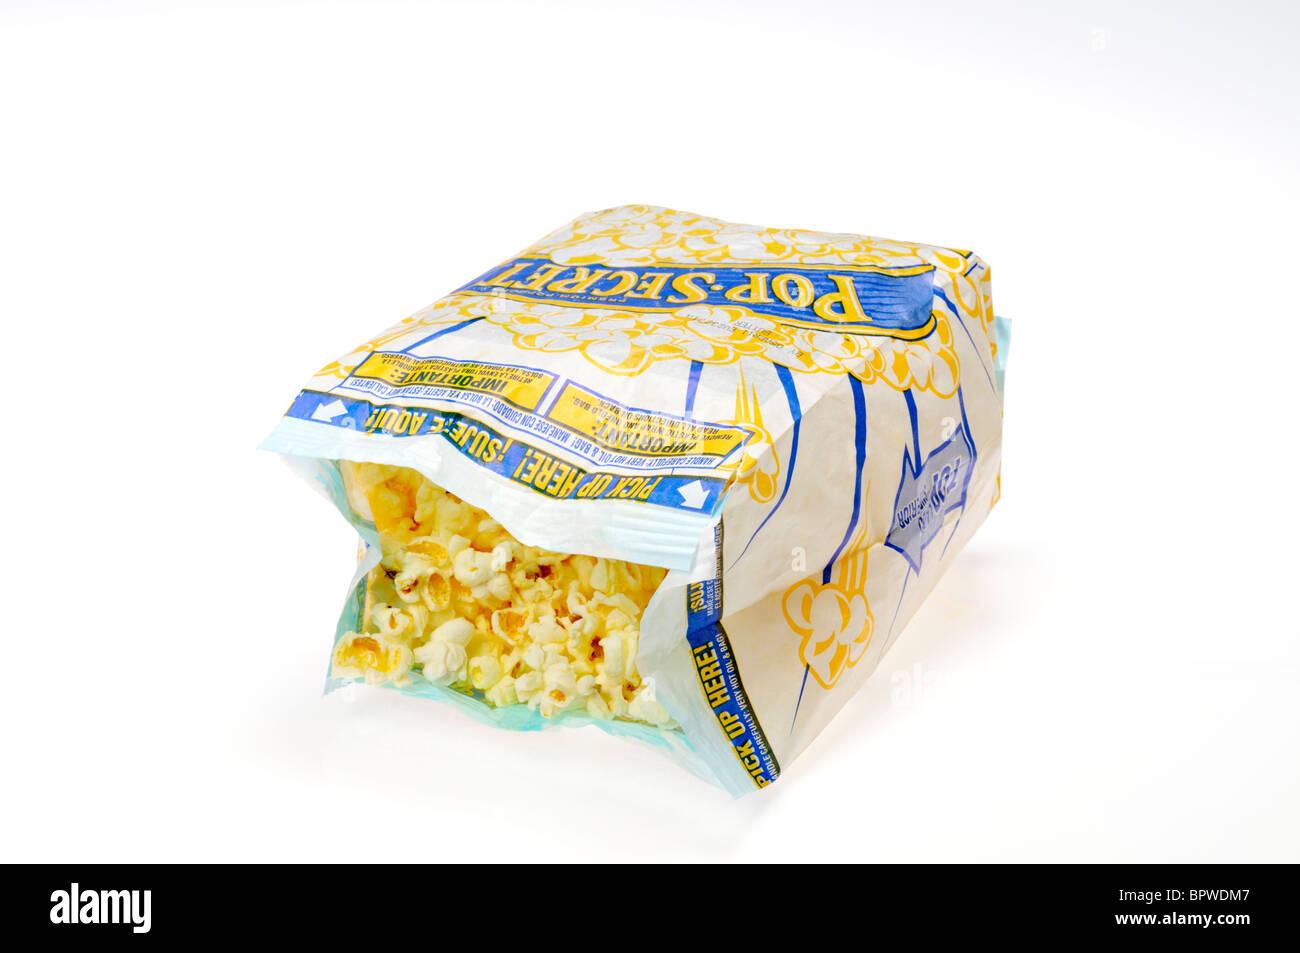 https www alamy com stock photo an open bag of pop secret microwave popcorn on white background cutout 31292359 html